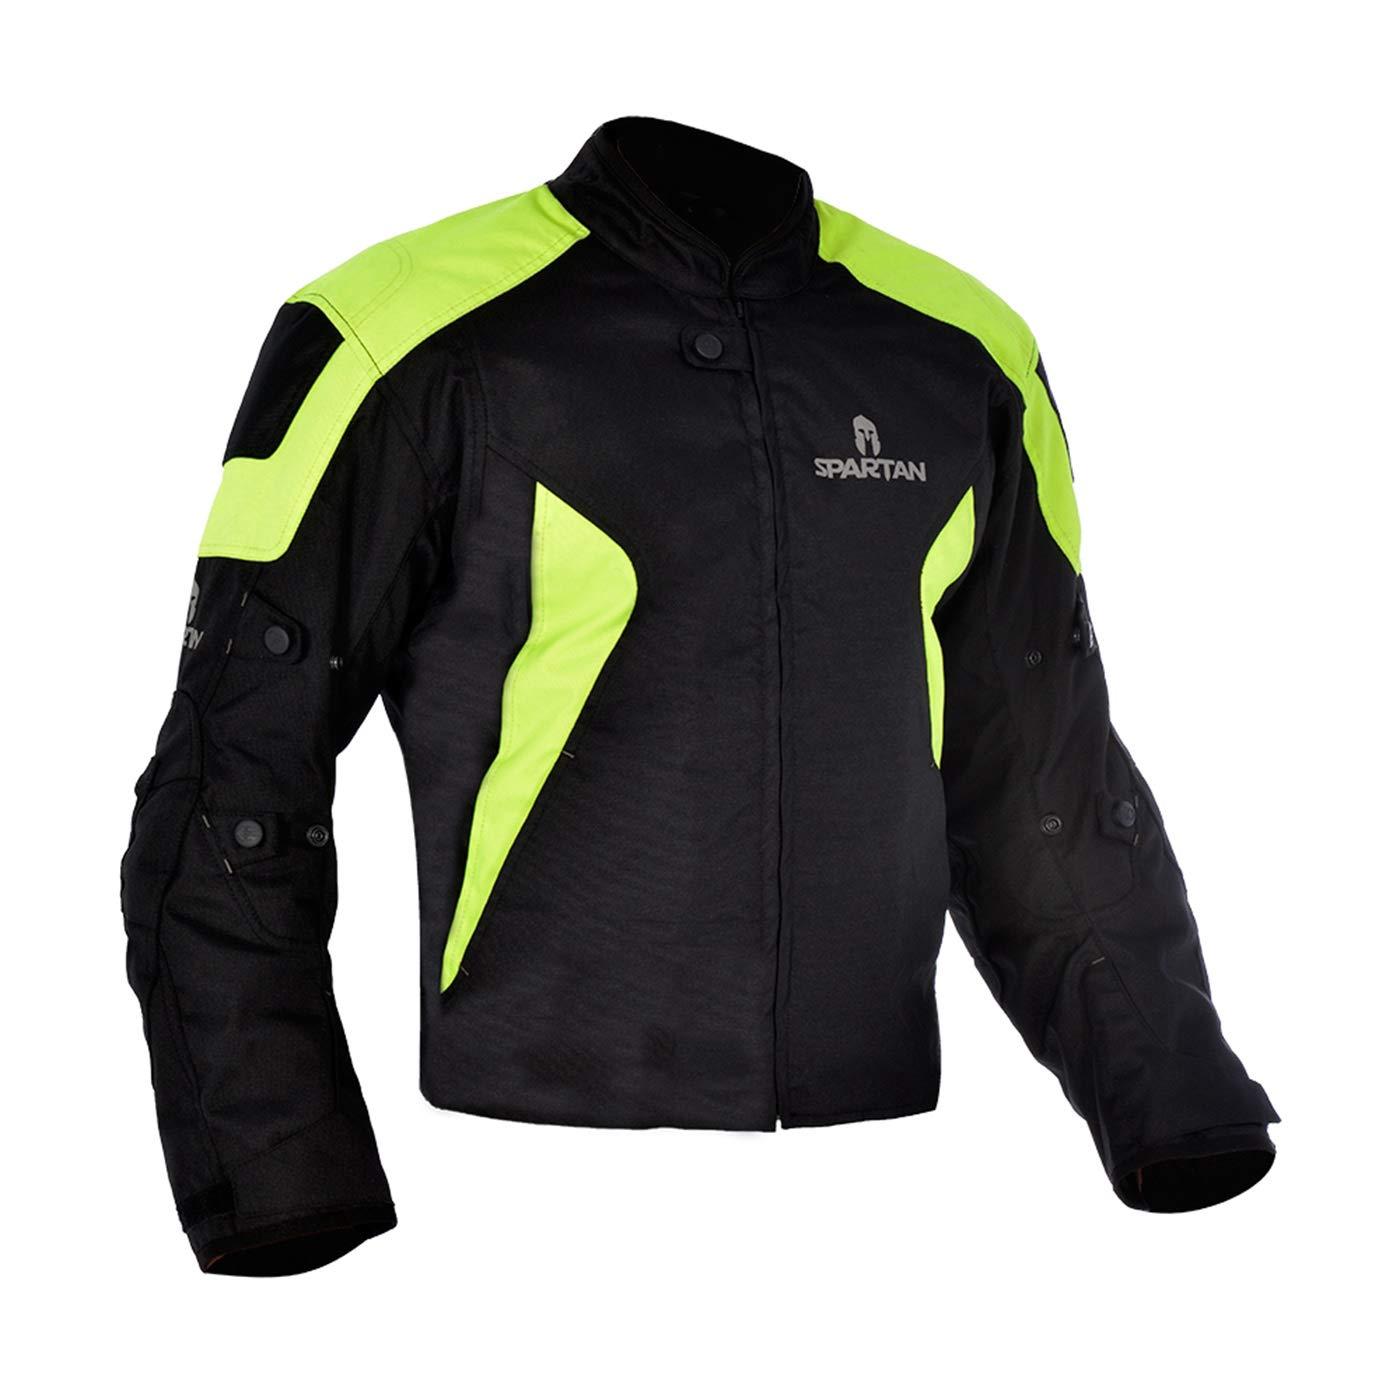 Oxford Mens Spartan Textile Short Jacket Black Small J17SBS